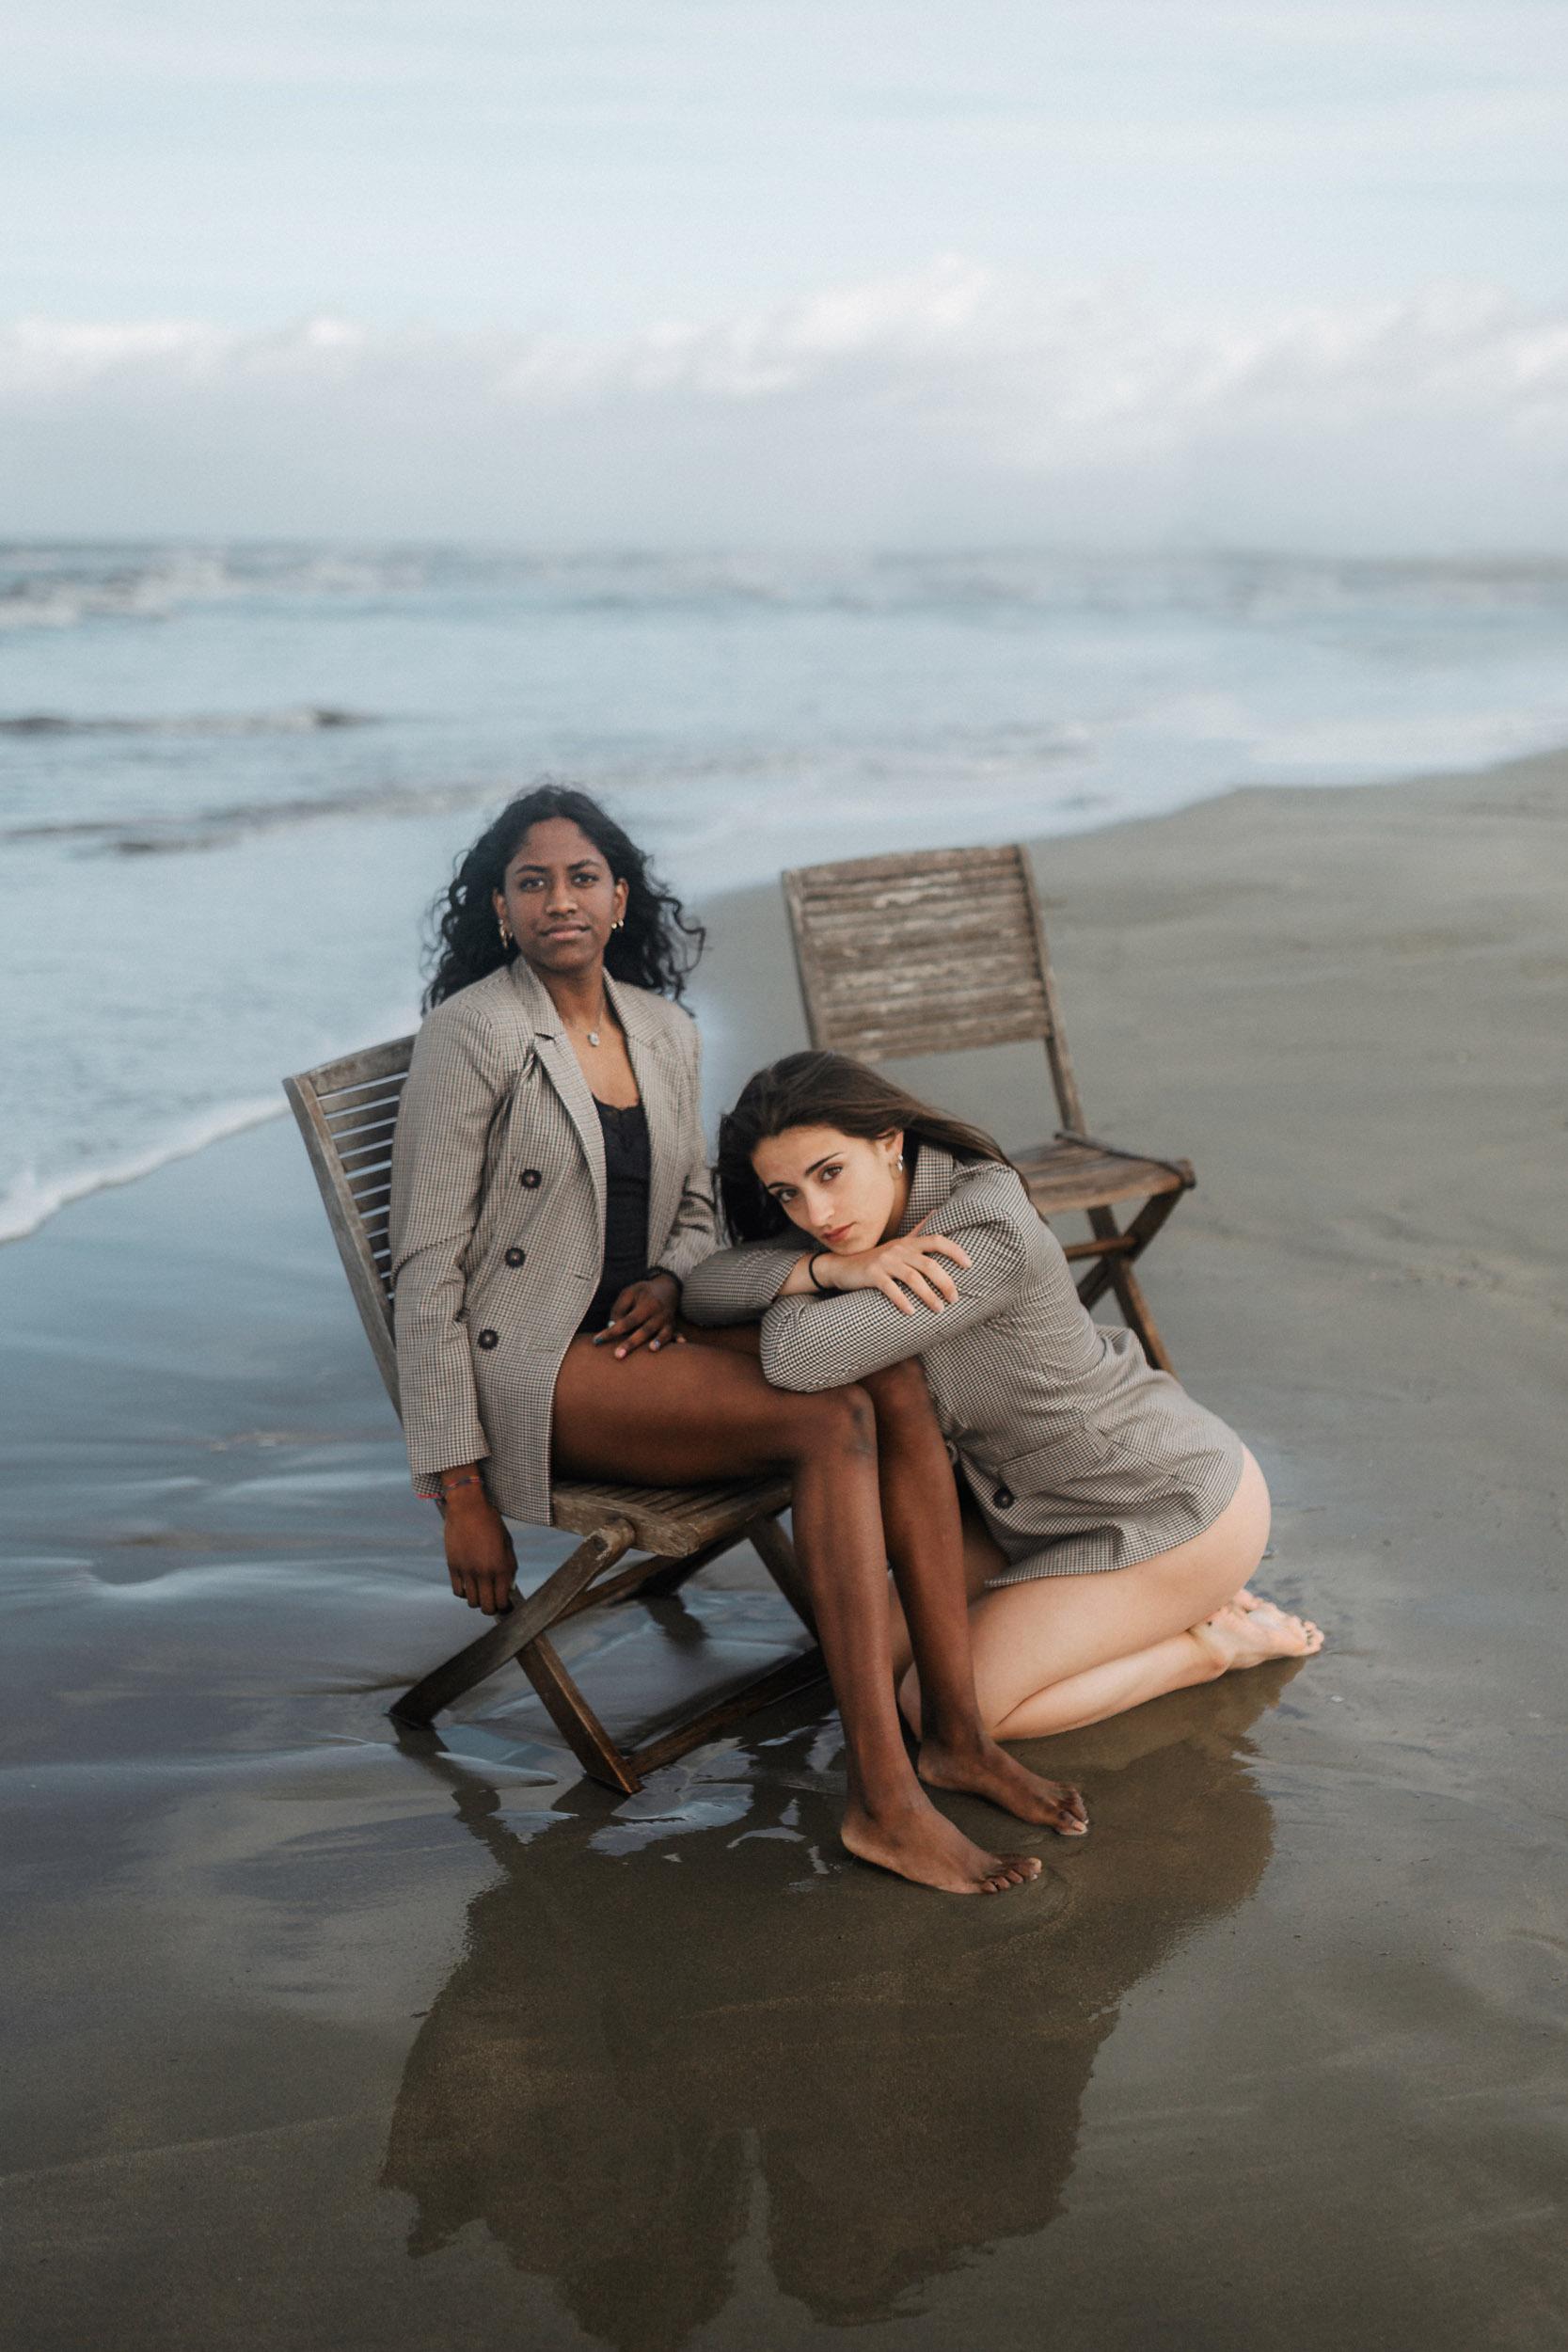 Categorie: Glamour, Portrait - Ph. Virginia Imbimbo- Model: Marta Giaele Giovannini- Chanda Bottino - Assistente: Luca Martella - Location: Tirrenia, PI, Italia